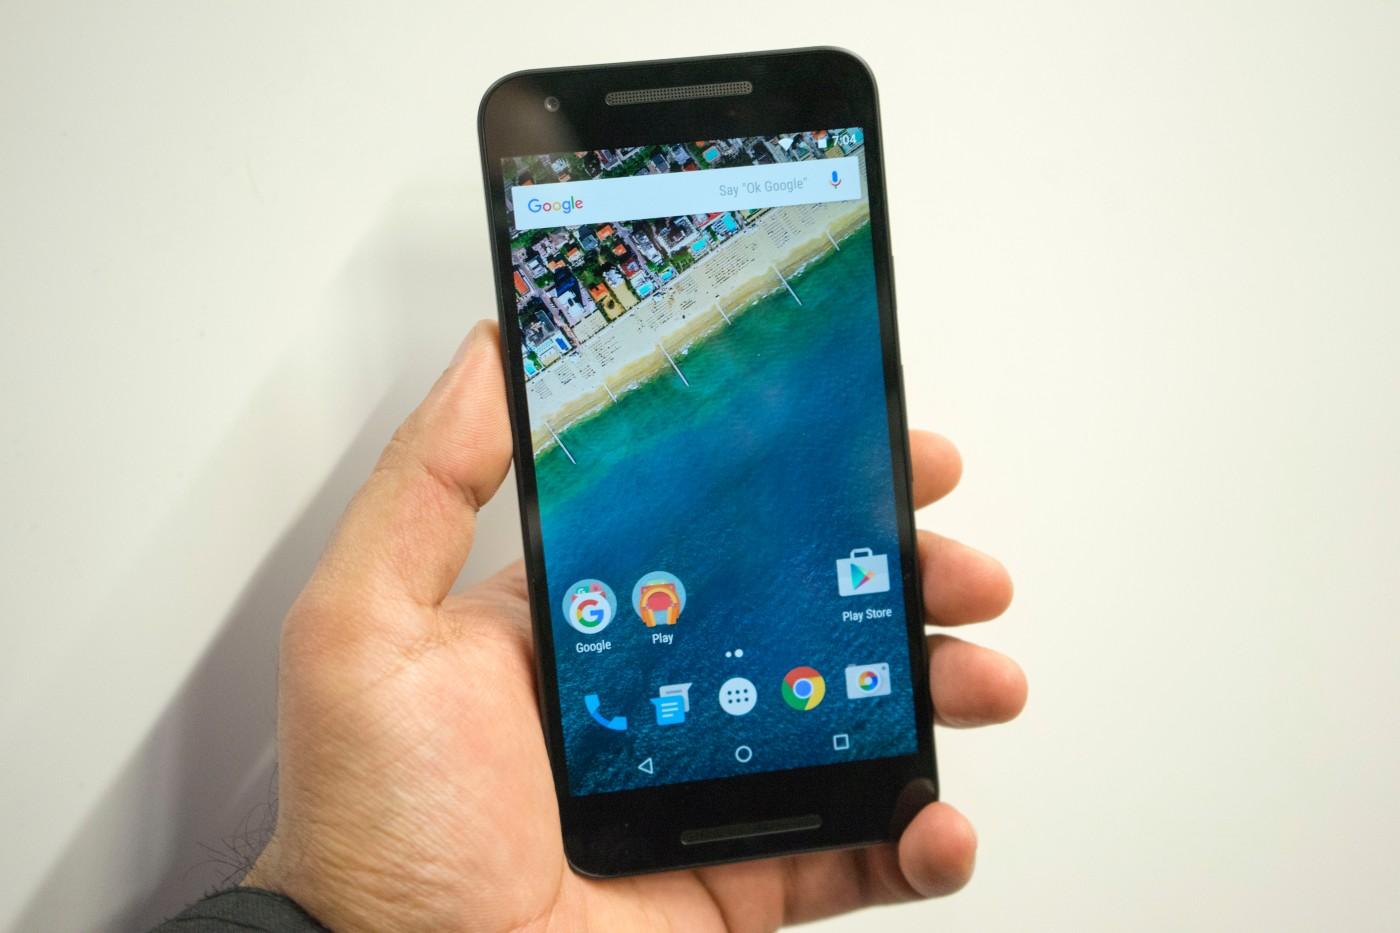 Google Nexus 5X. Photo credit TechStage via Flickr.